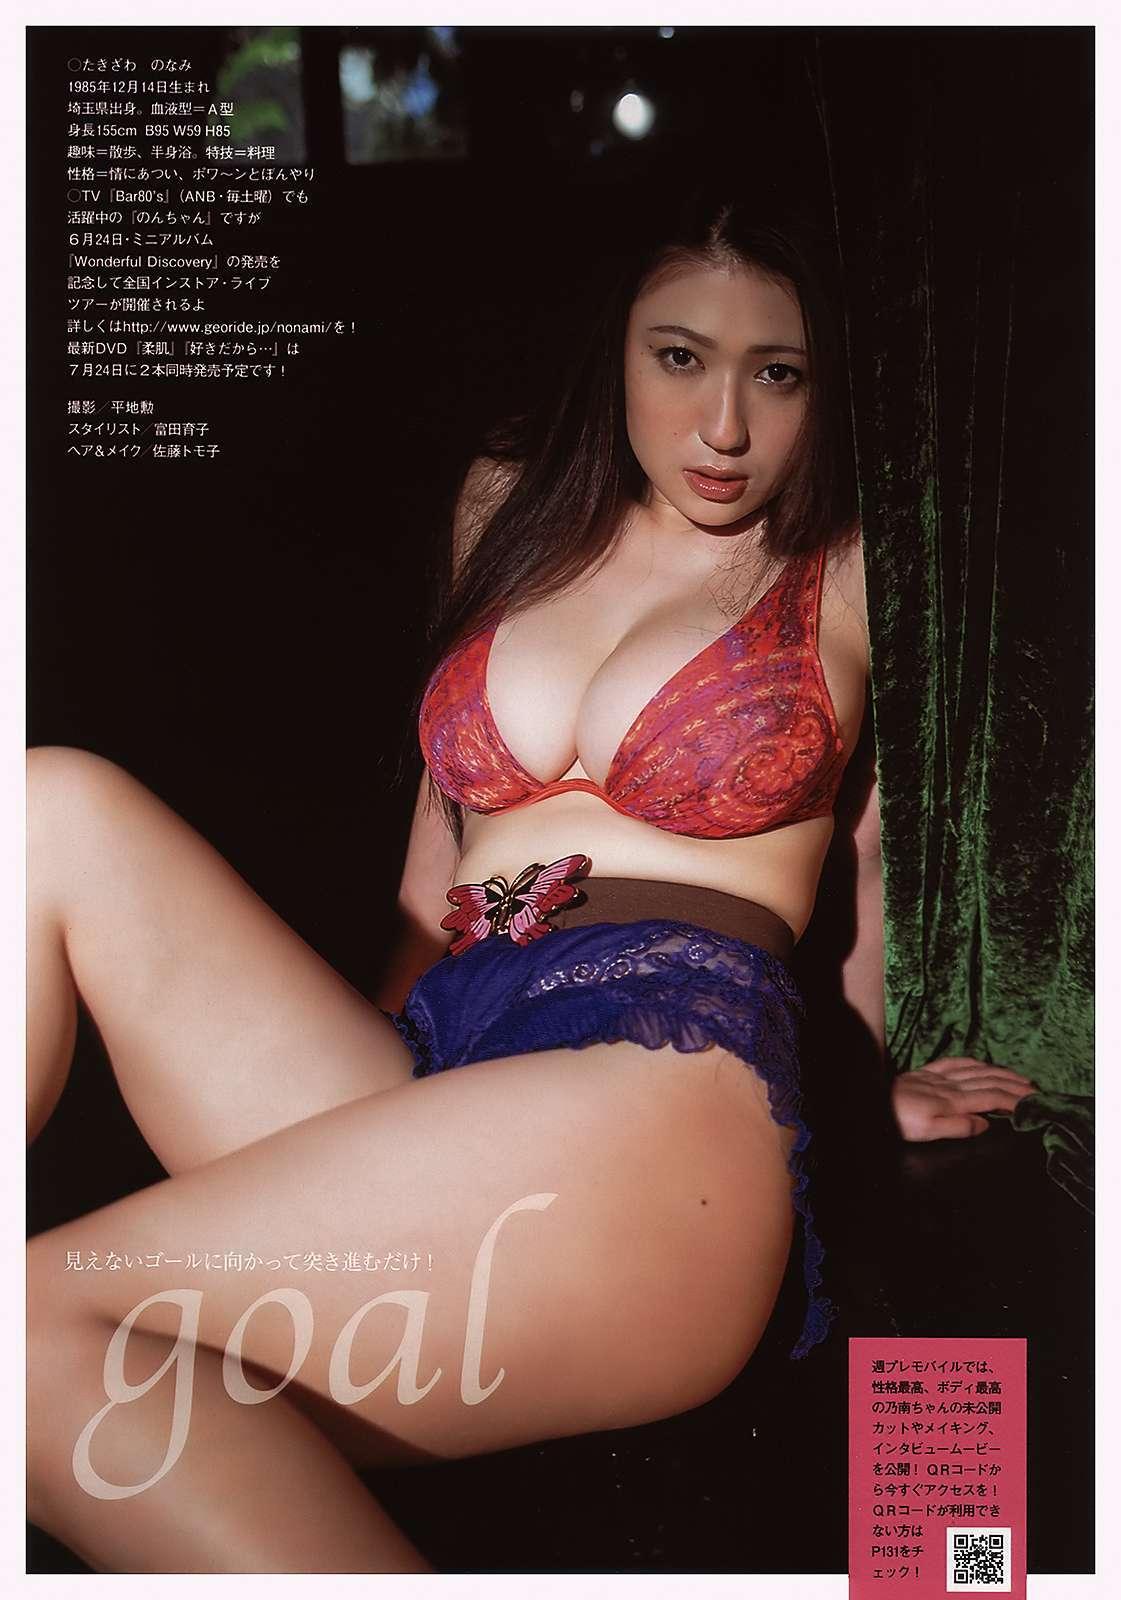 takizawa_nonami241.jpg